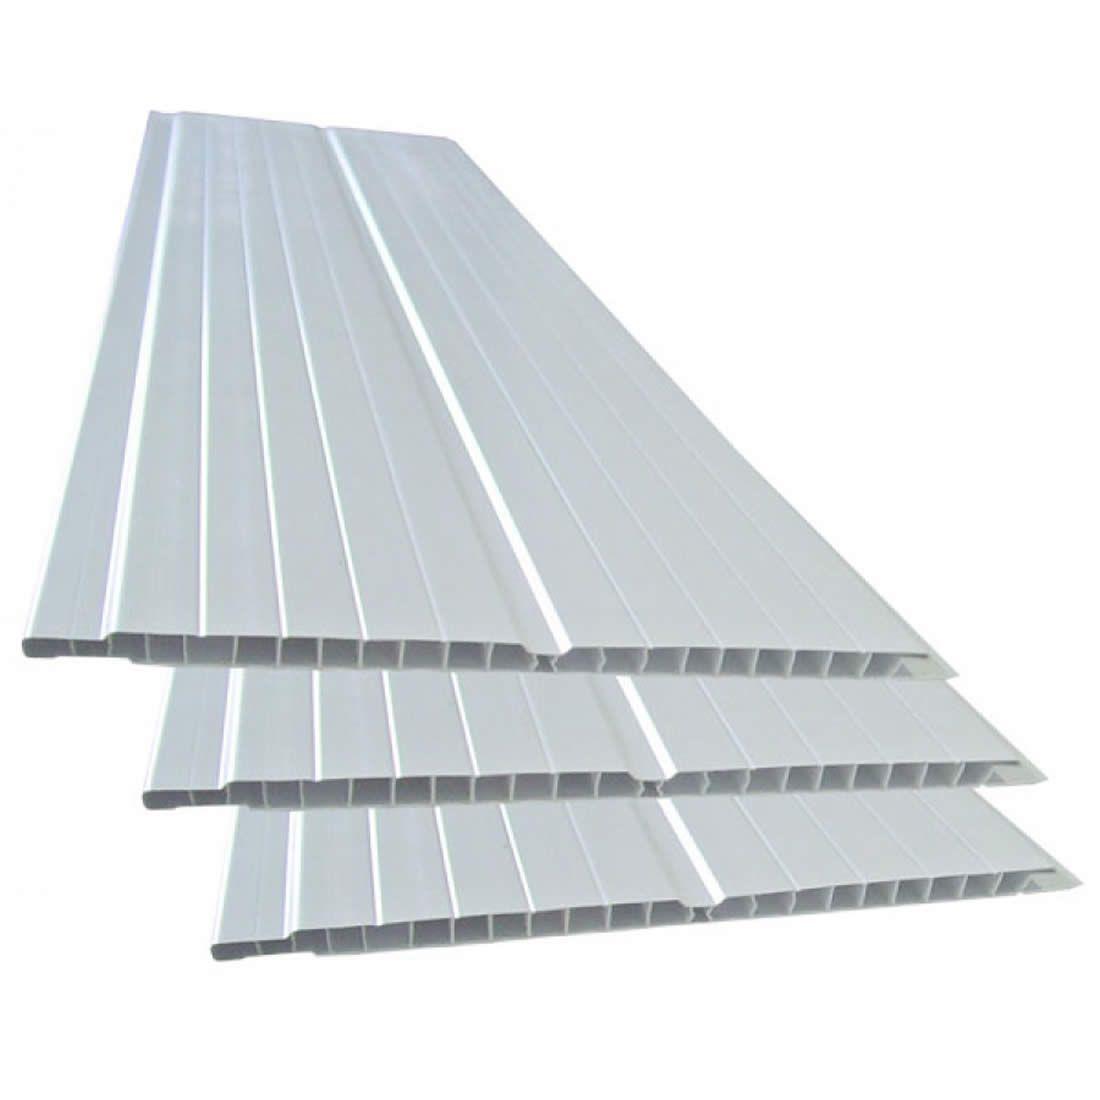 Forro PVC 200X8mm de 7,00 Metros Frisado Branco Mais PVC, 1,40mts = 1 Peças